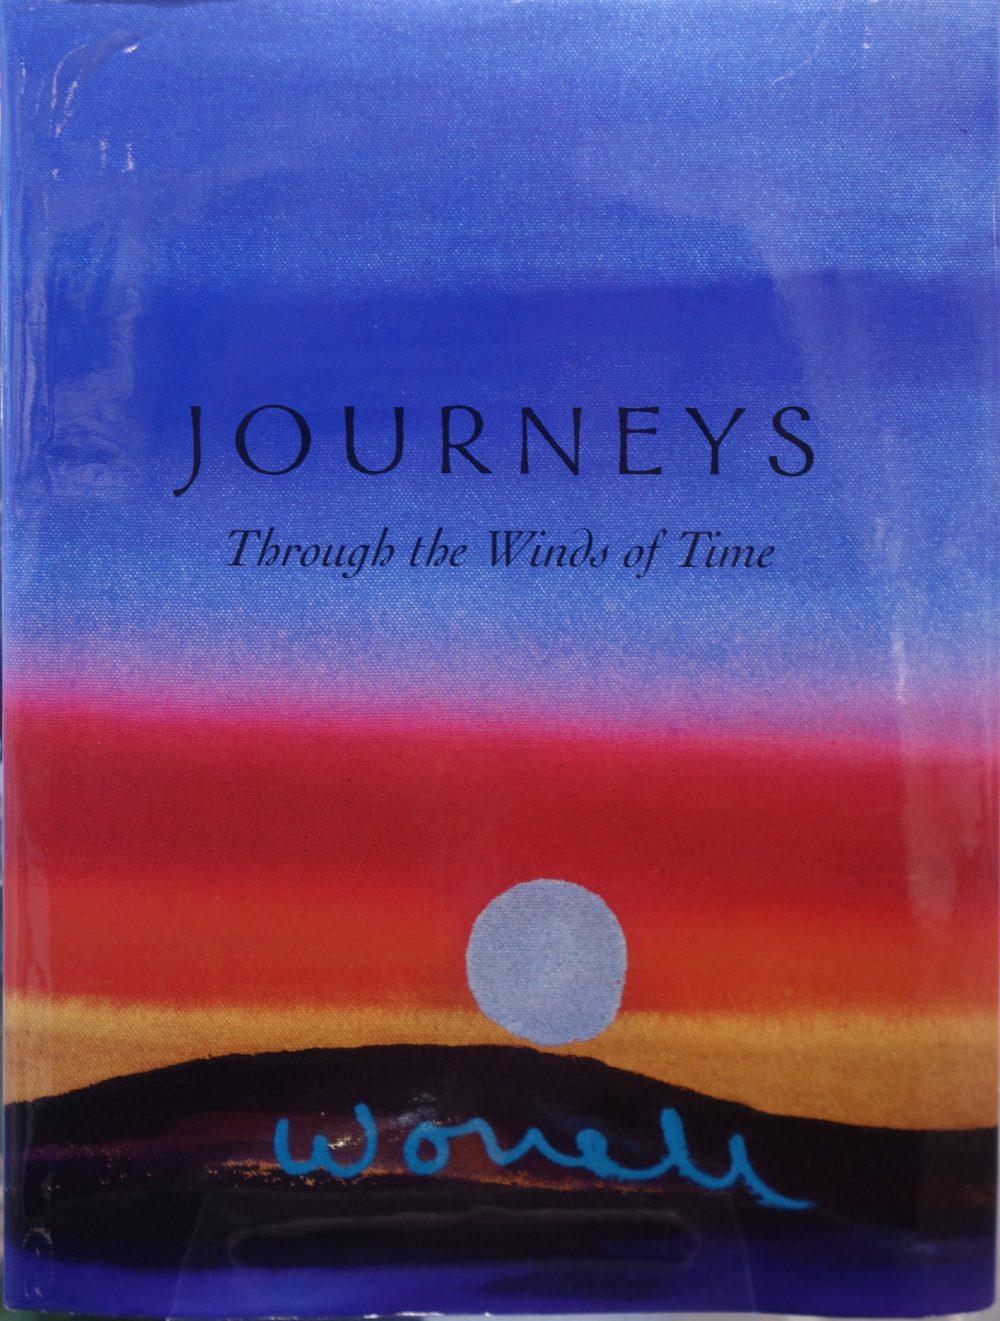 Journeys Through the Winds of Time | Bill Worrell | Book-Exposures International Gallery of Fine Art - Sedona AZ